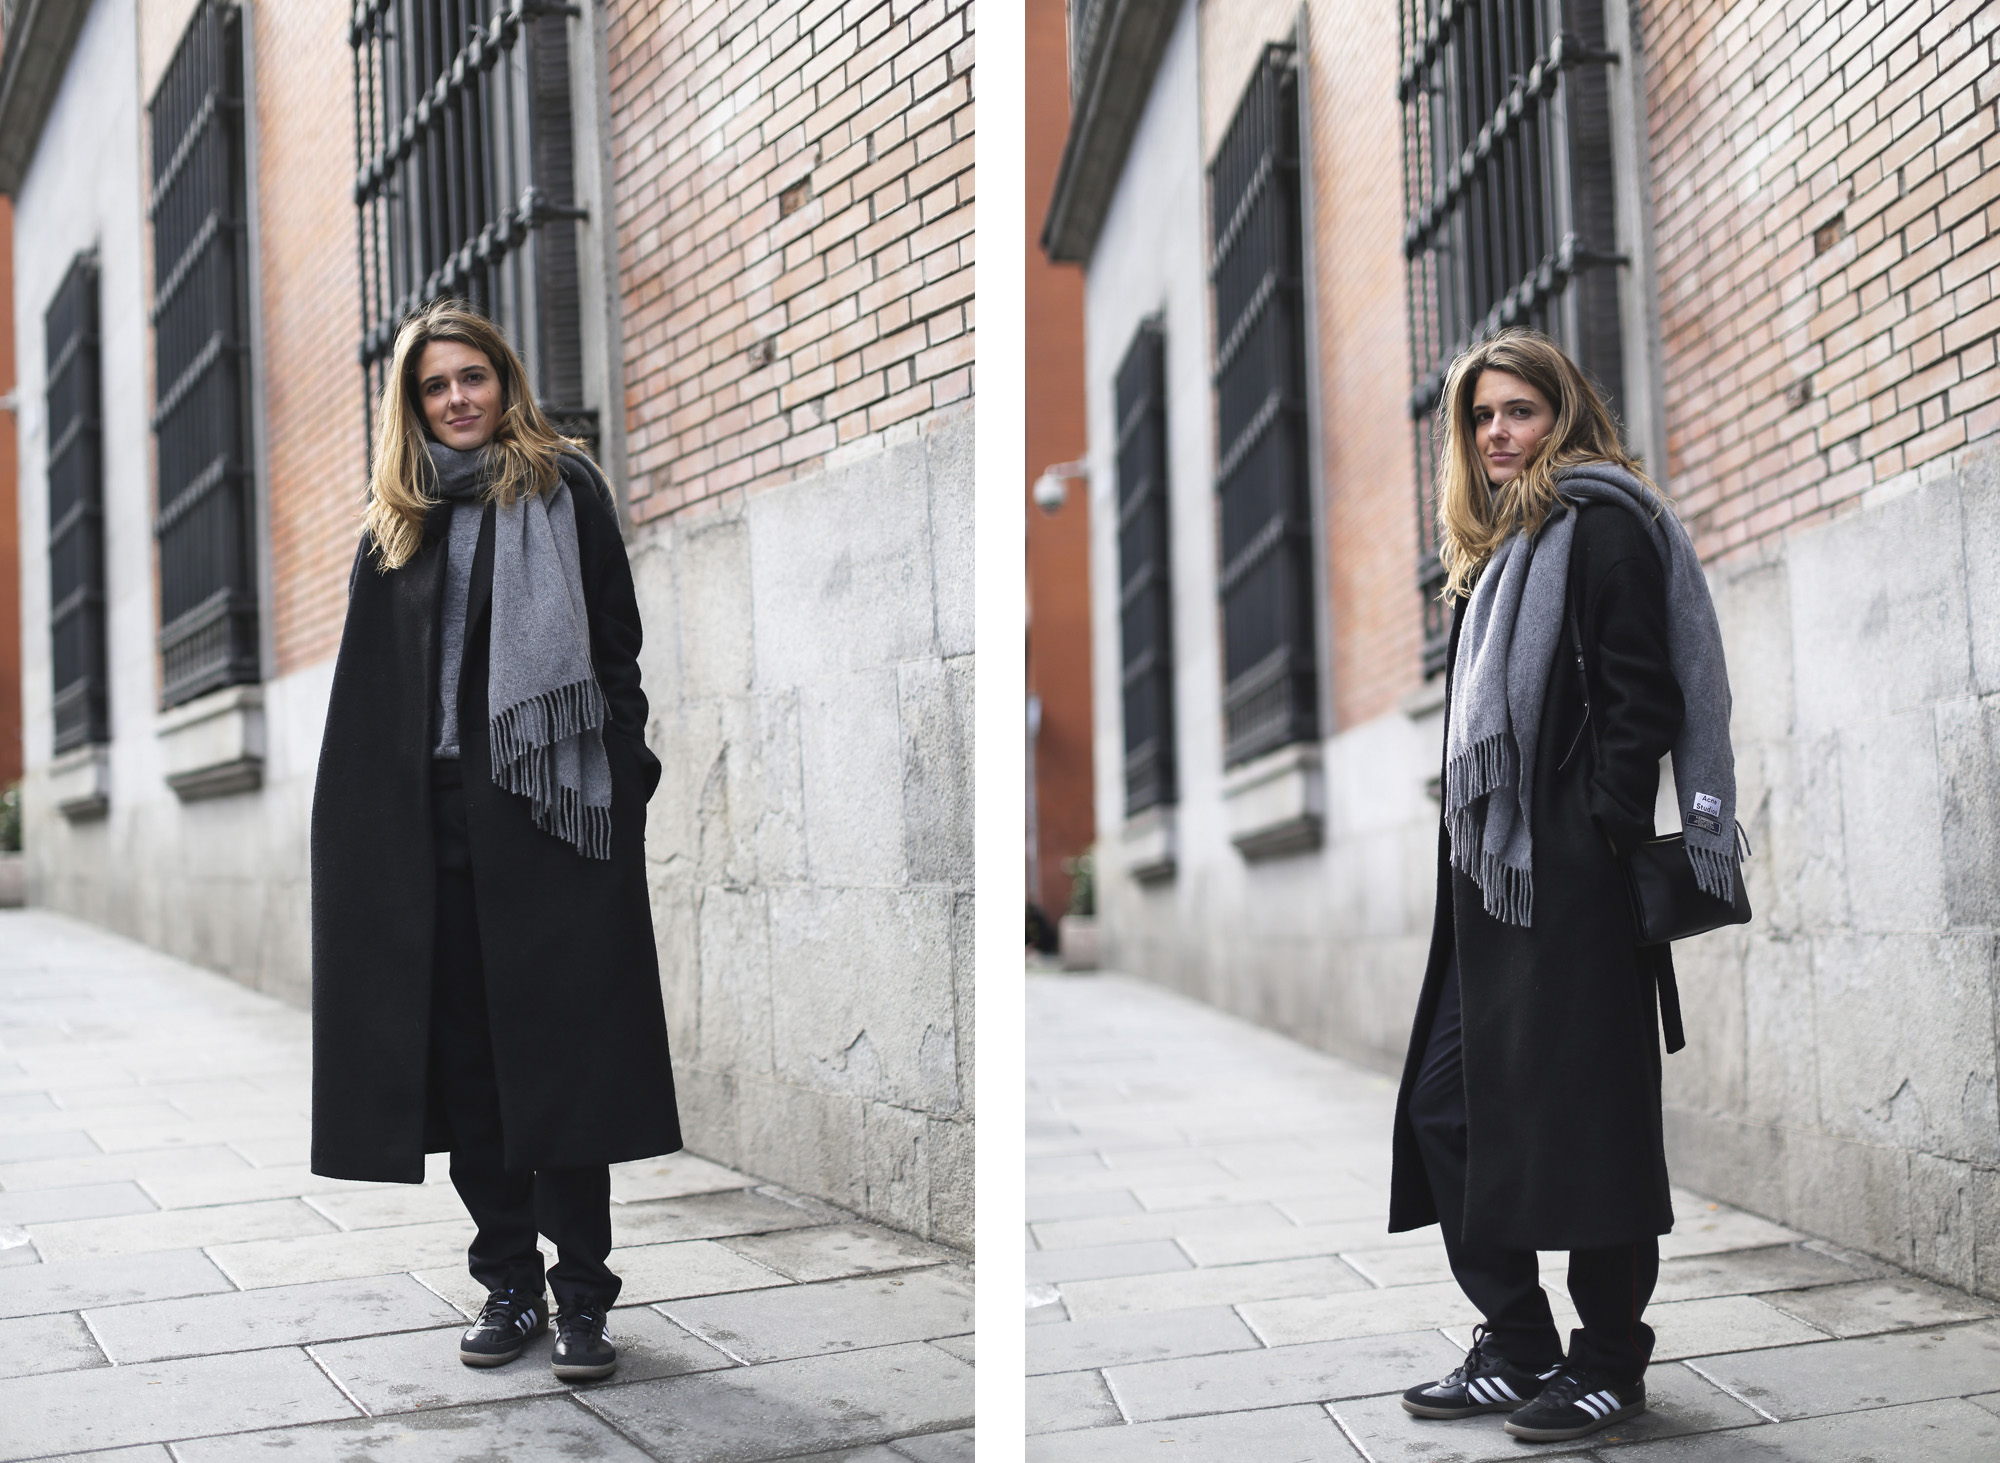 Clochet_streetstyle_cos_wool_long_coat_maje_panta_adidas_samba-20